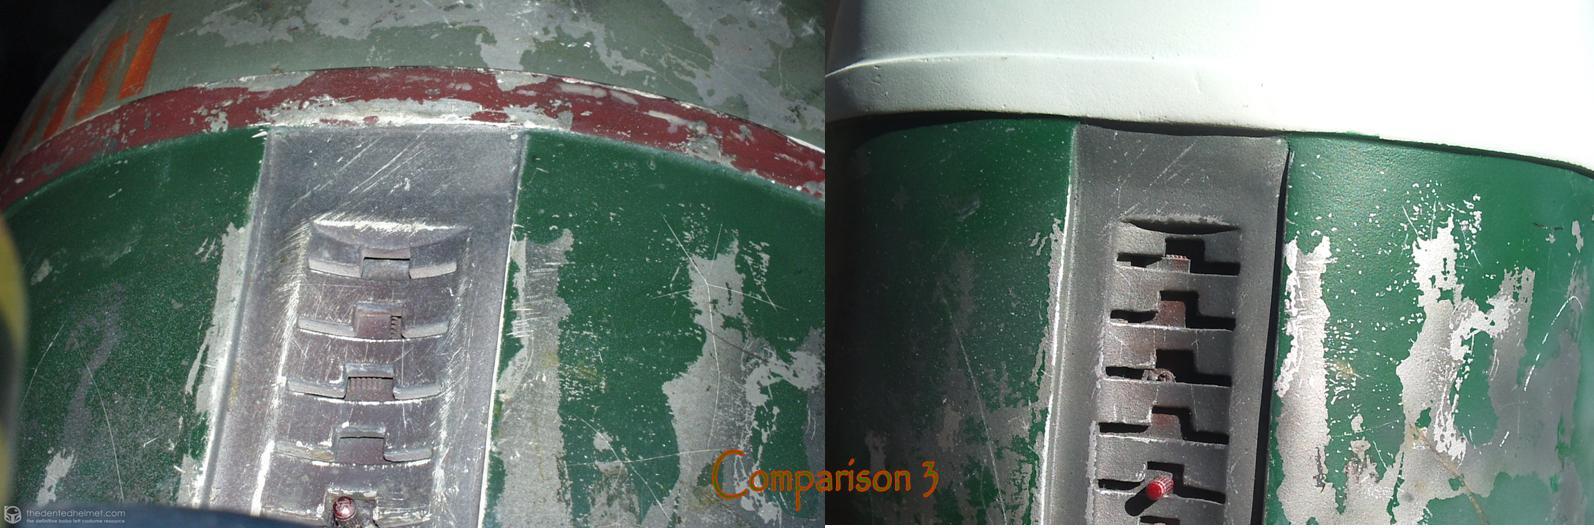 comparison 3.jpg